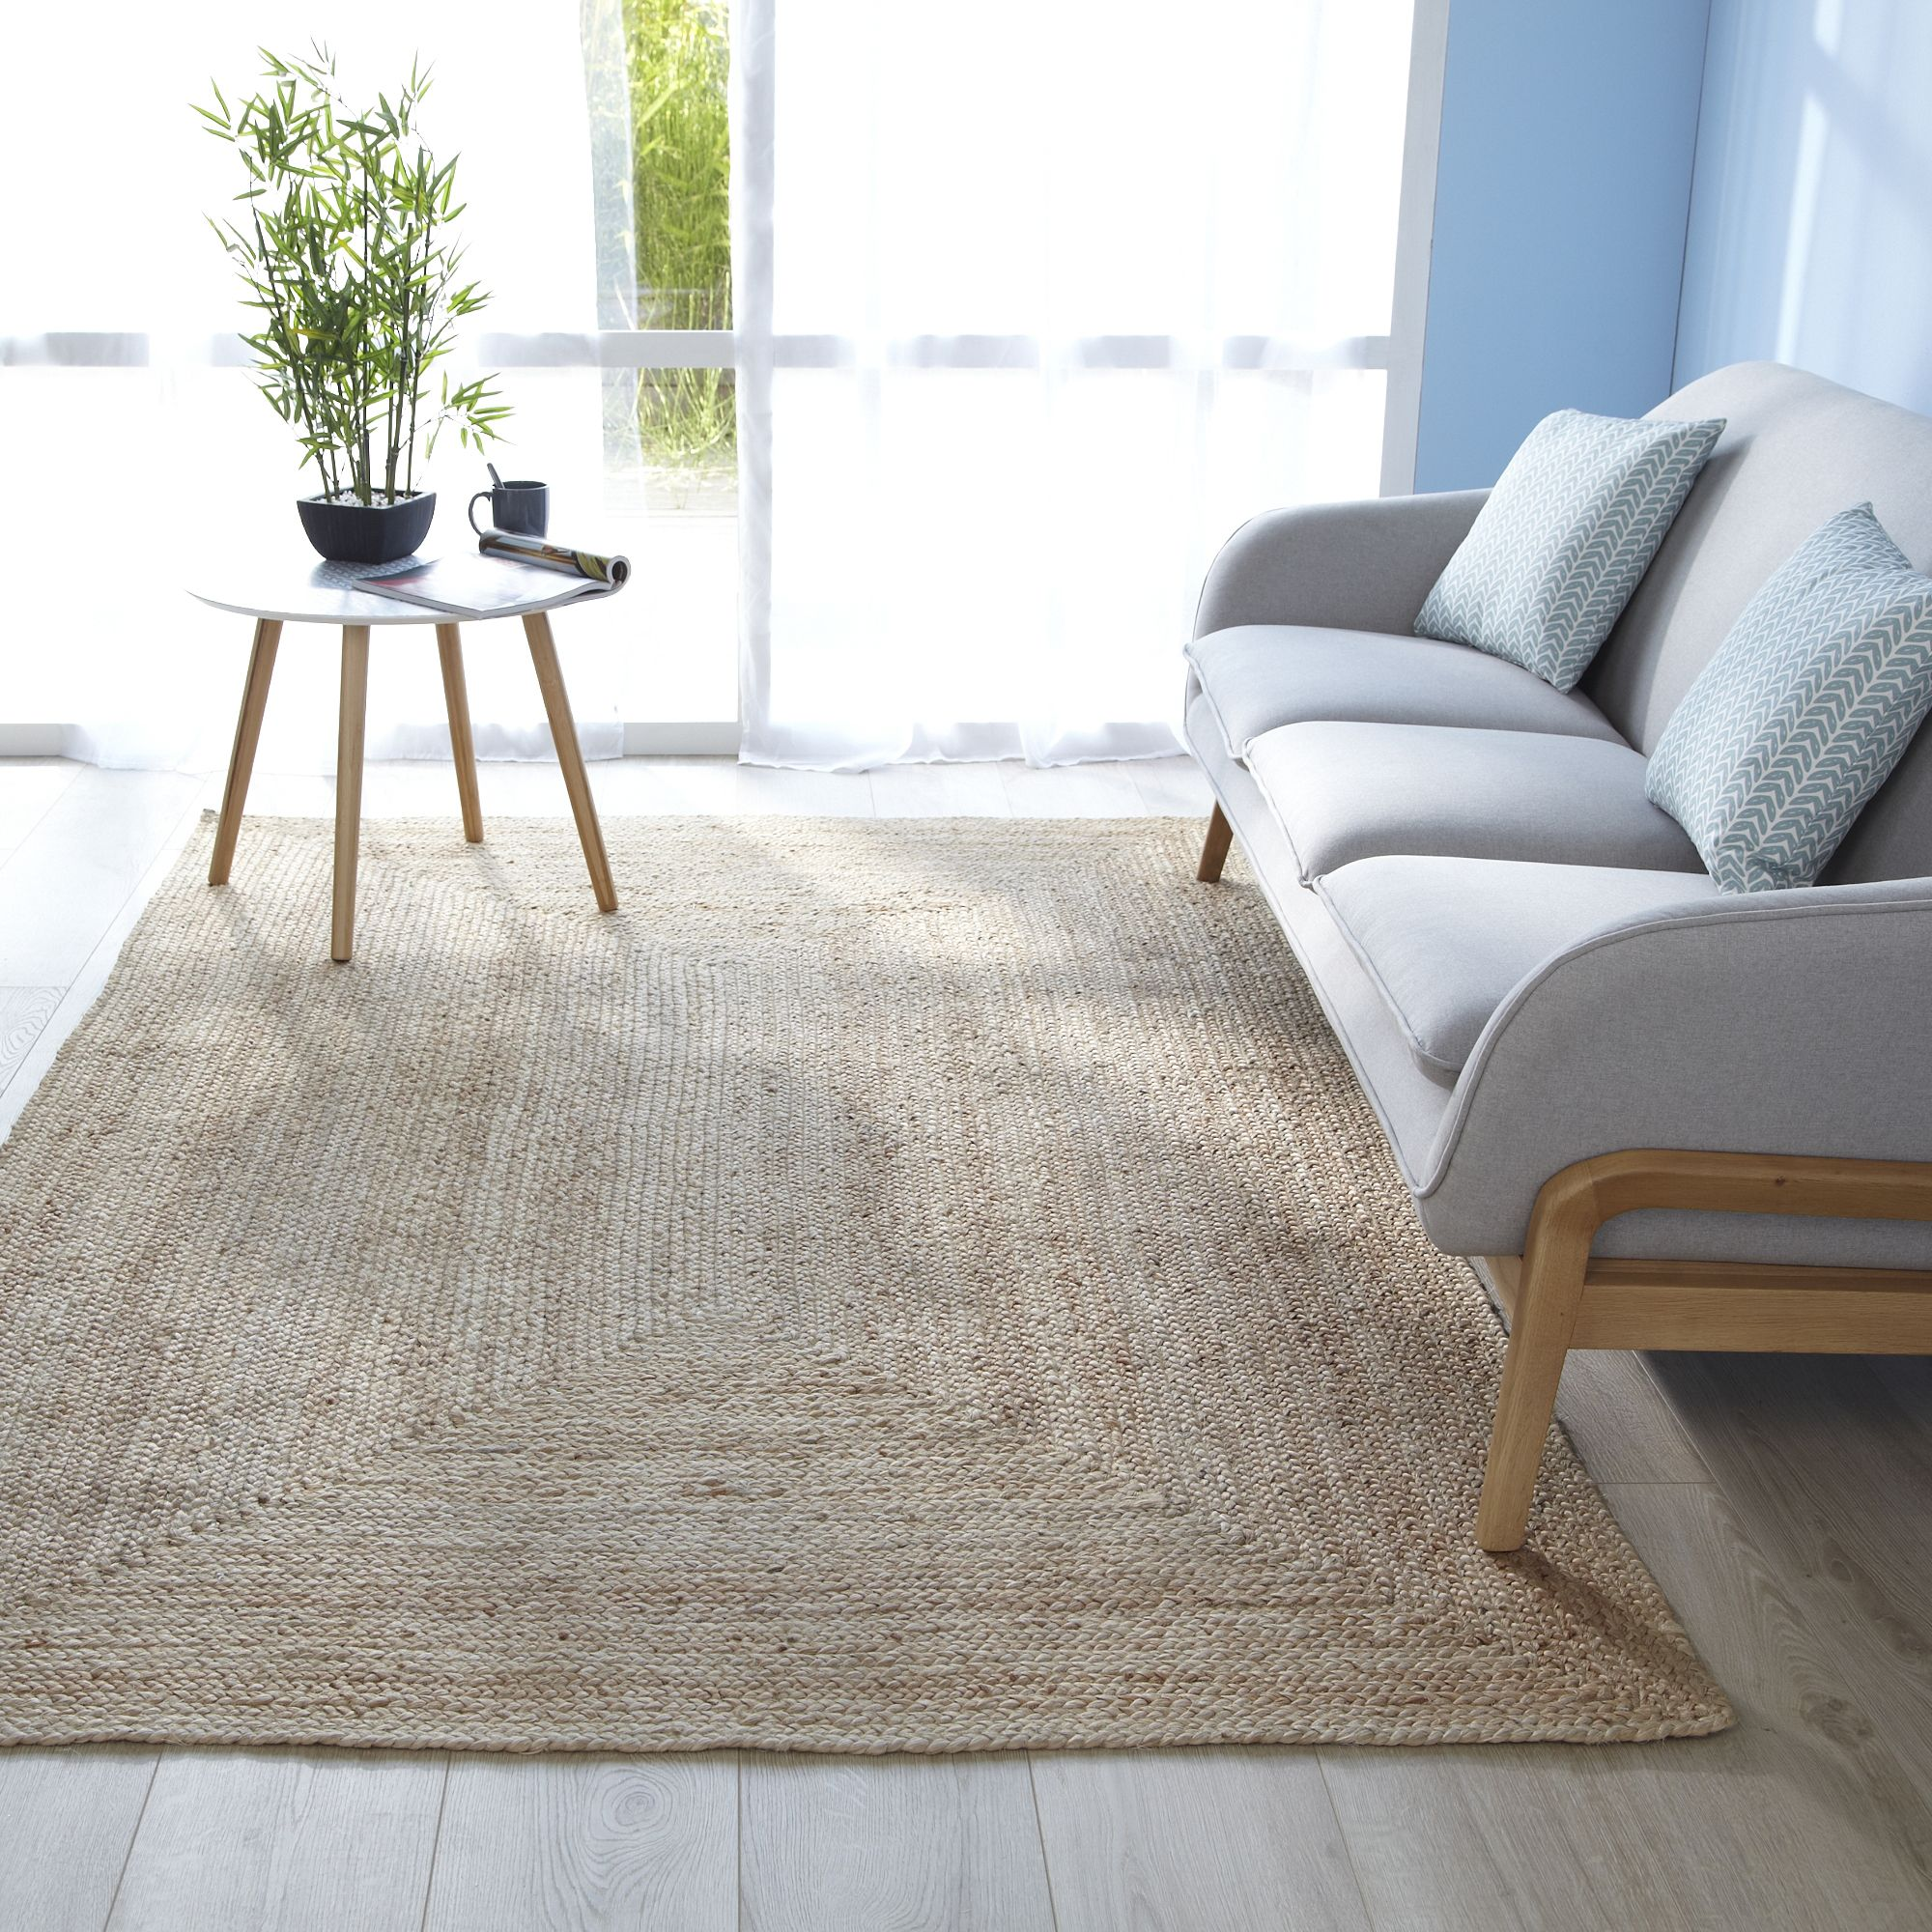 rush text tapis en jute alin a tendance naturelle pinterest alin a tapis et jute. Black Bedroom Furniture Sets. Home Design Ideas